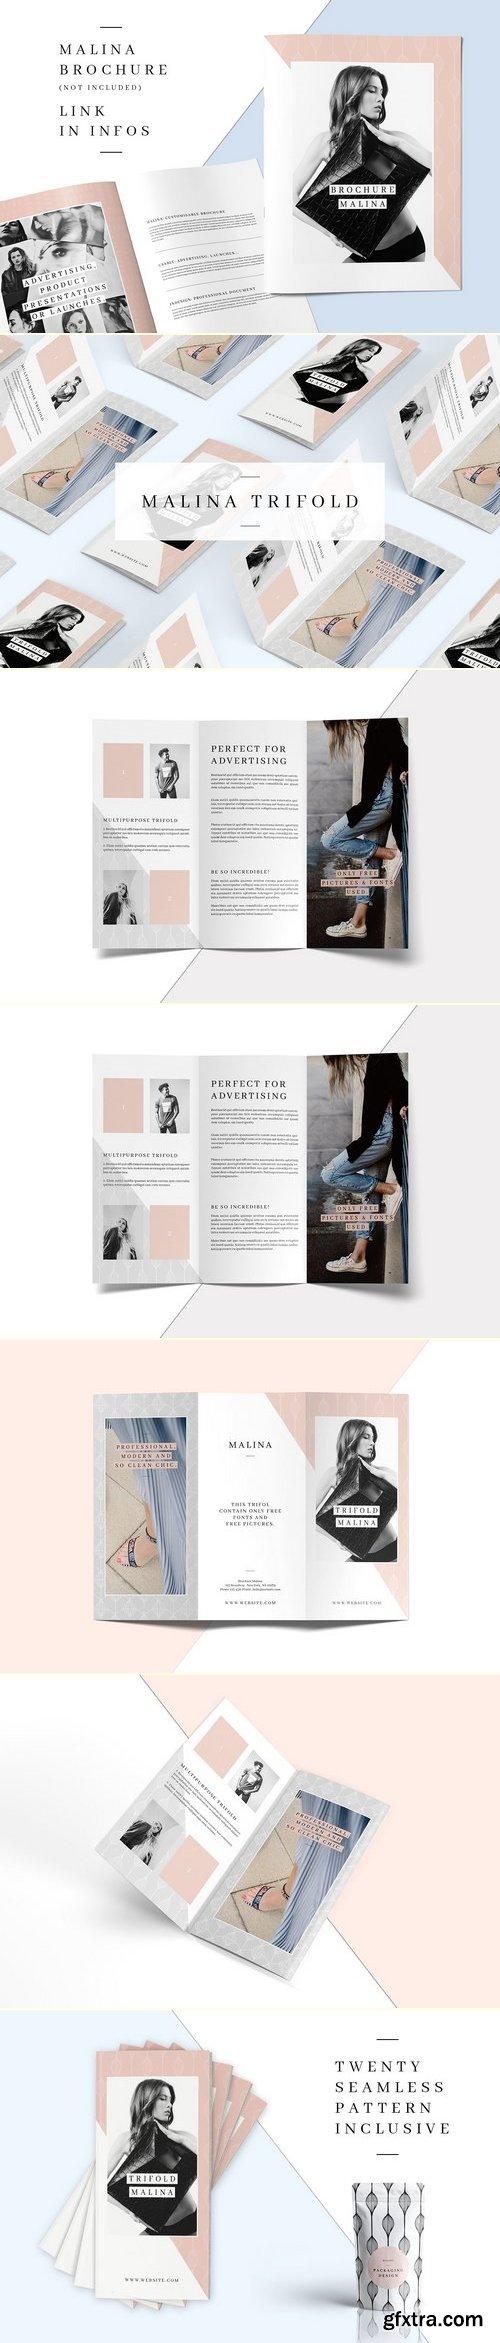 CM - MALINA Trifold Brochure + Pattern 1415320